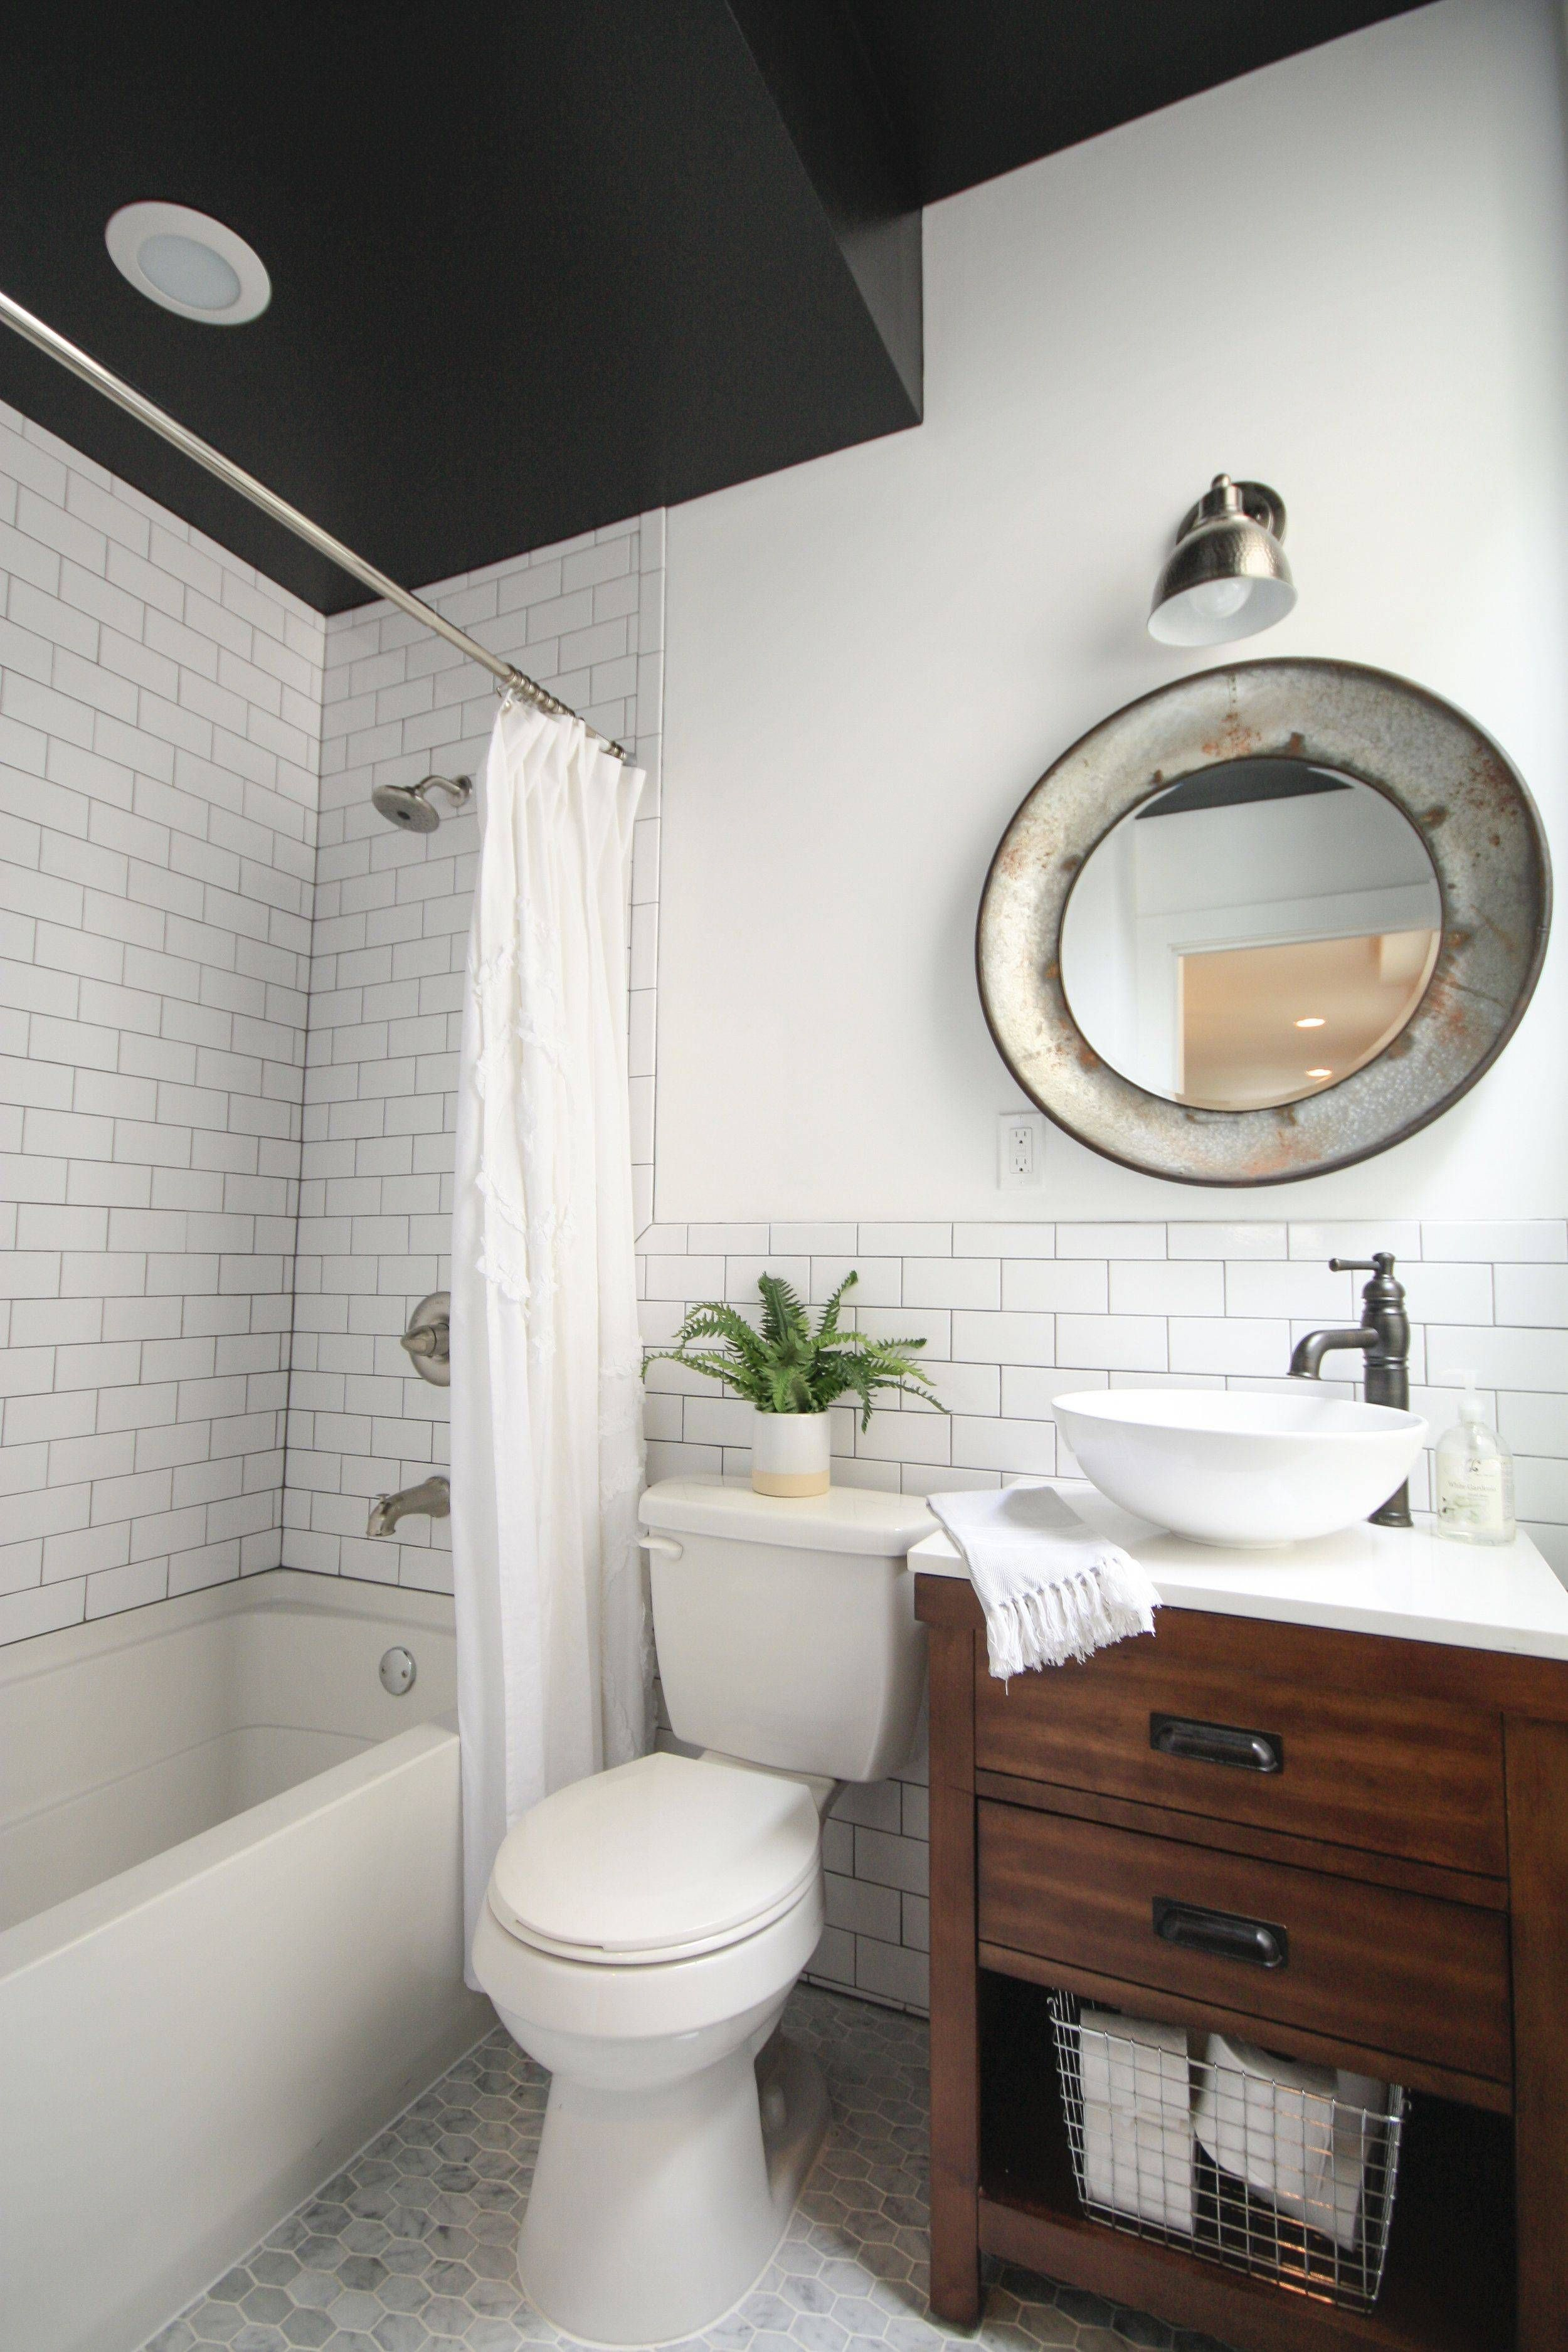 Black And White Tile Bathroom Decorating Ideas White Subway Tile